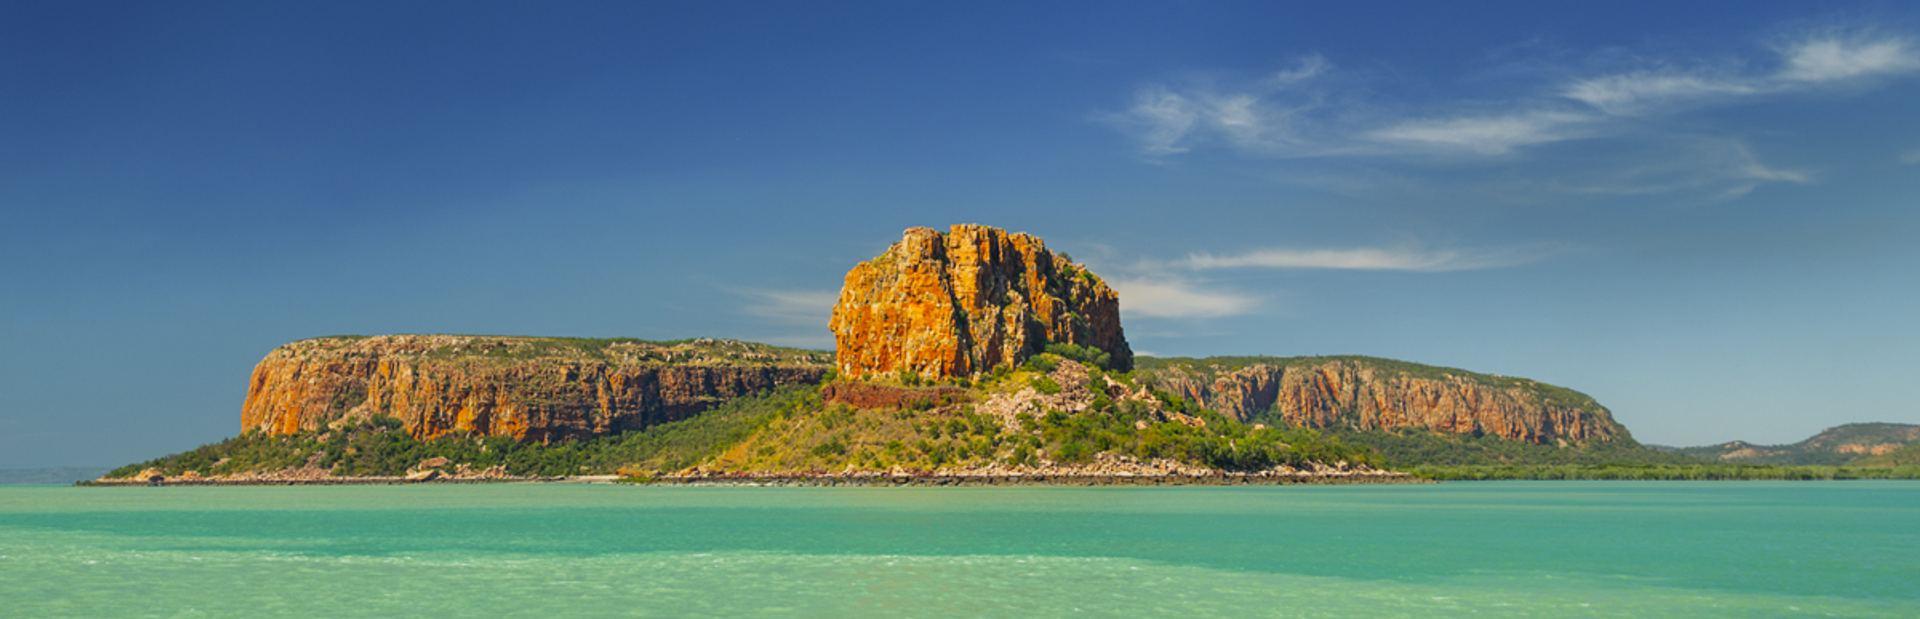 The Kimberley climate photo